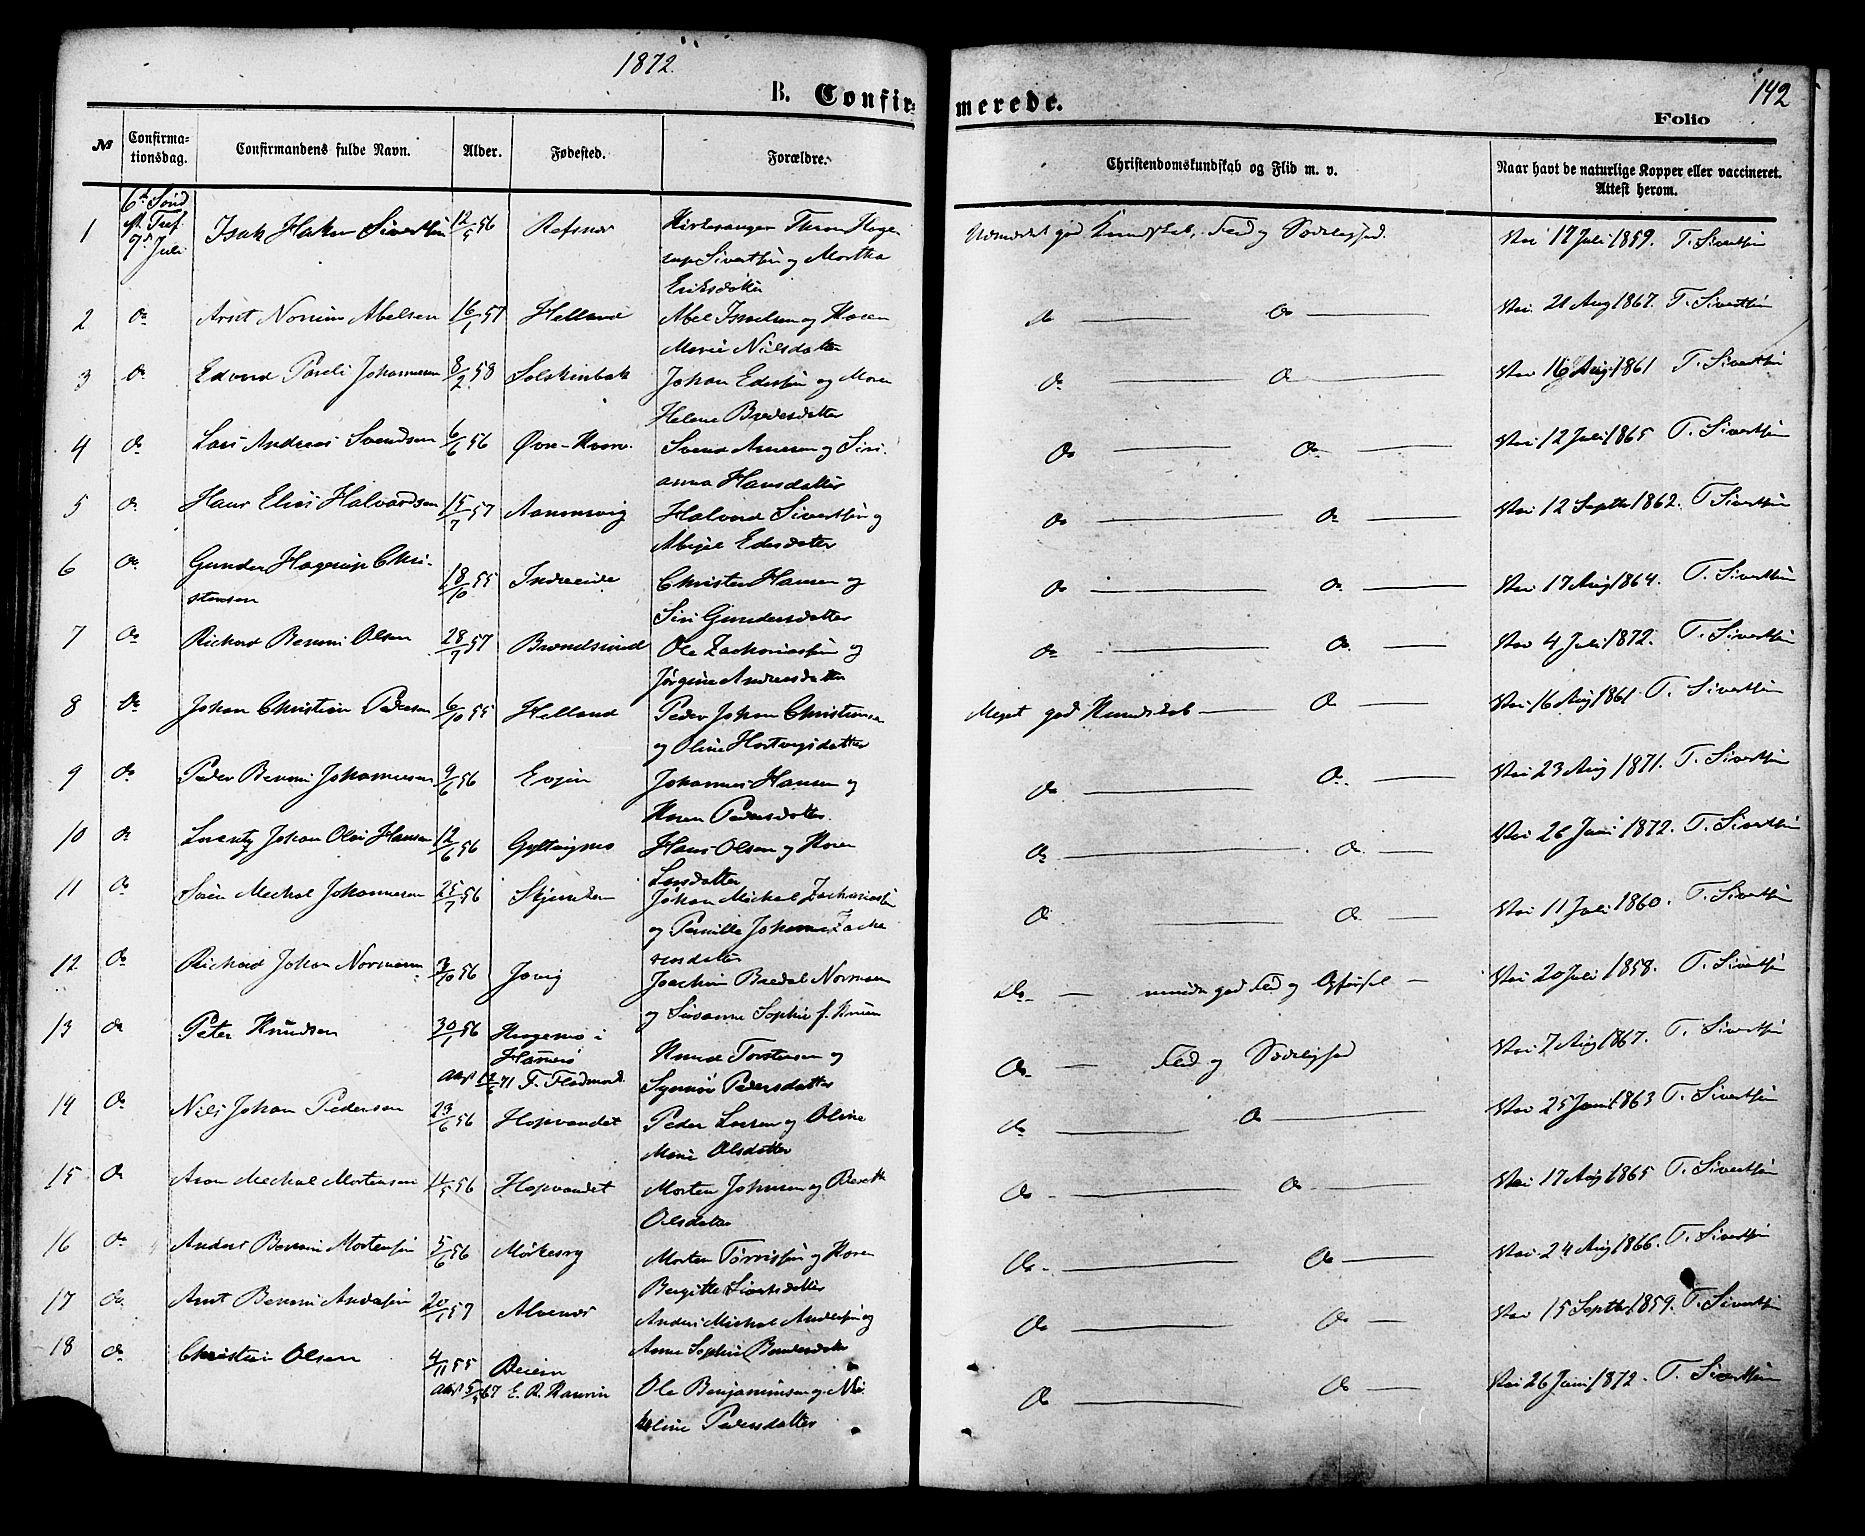 SAT, Ministerialprotokoller, klokkerbøker og fødselsregistre - Nordland, 853/L0771: Ministerialbok nr. 853A10, 1870-1881, s. 142